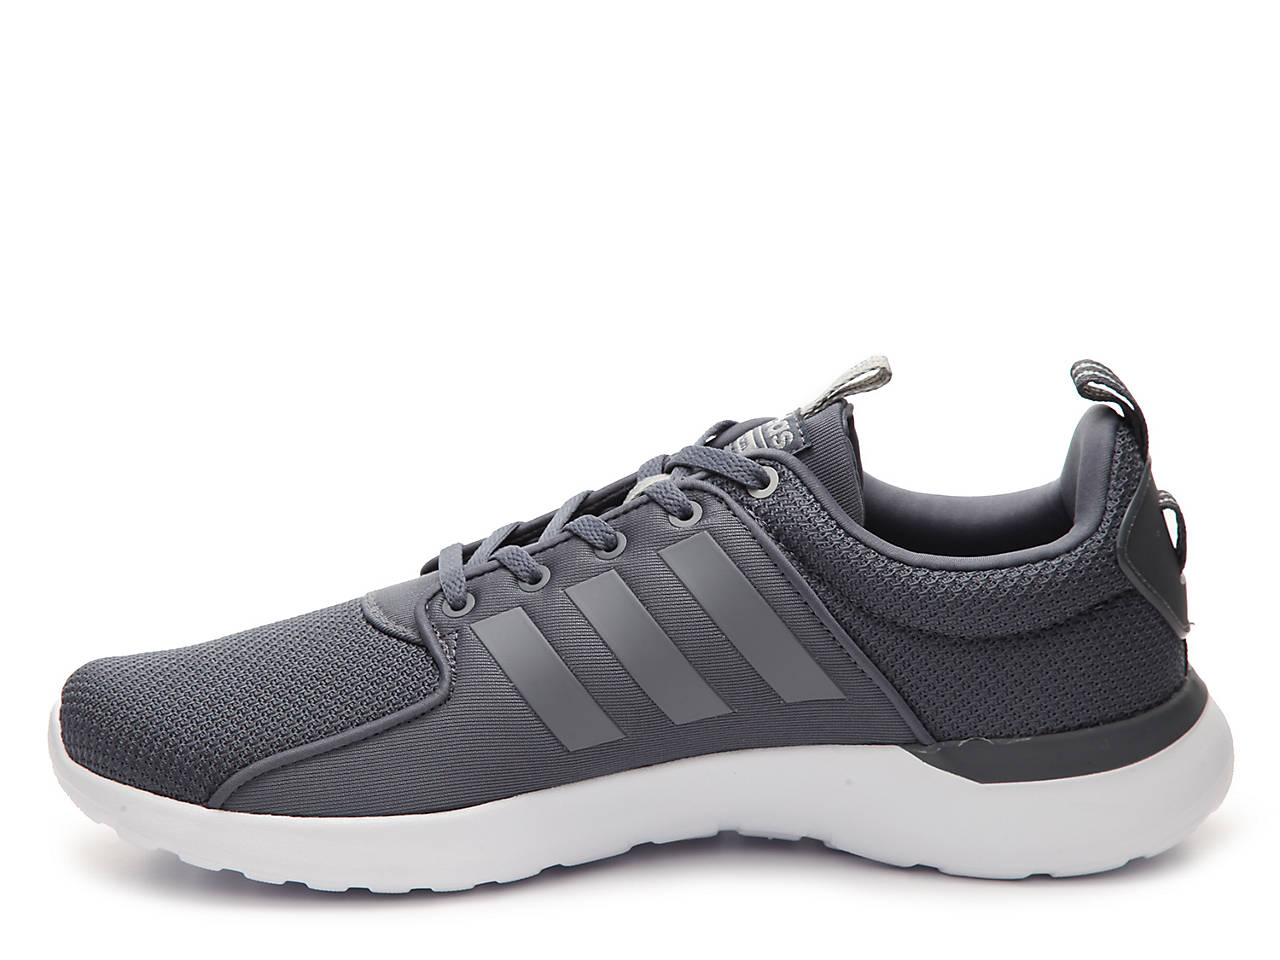 Adidas neo Lite Racer zapatilla hombre 's Hombre zapatos DSW